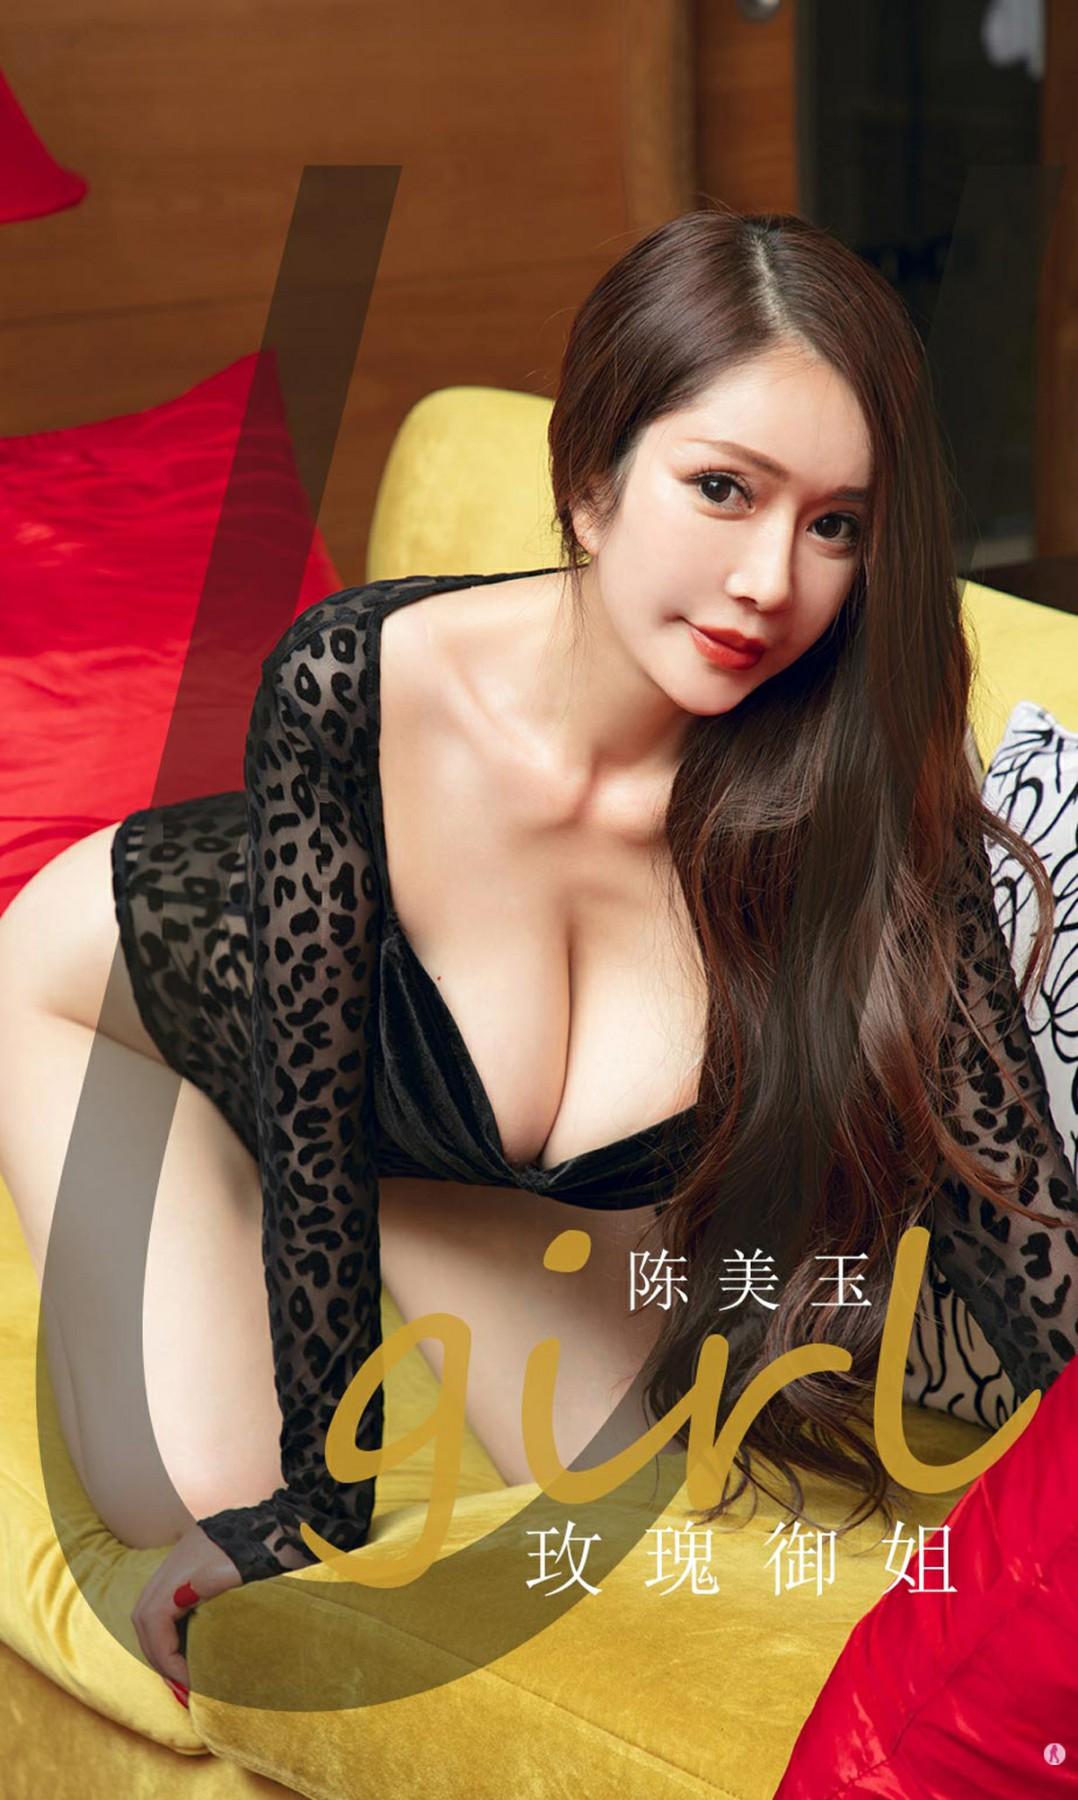 [Ugirls尤果网]爱尤物专辑 2020.09.18 No.1912 陈美玉 玫瑰御姐